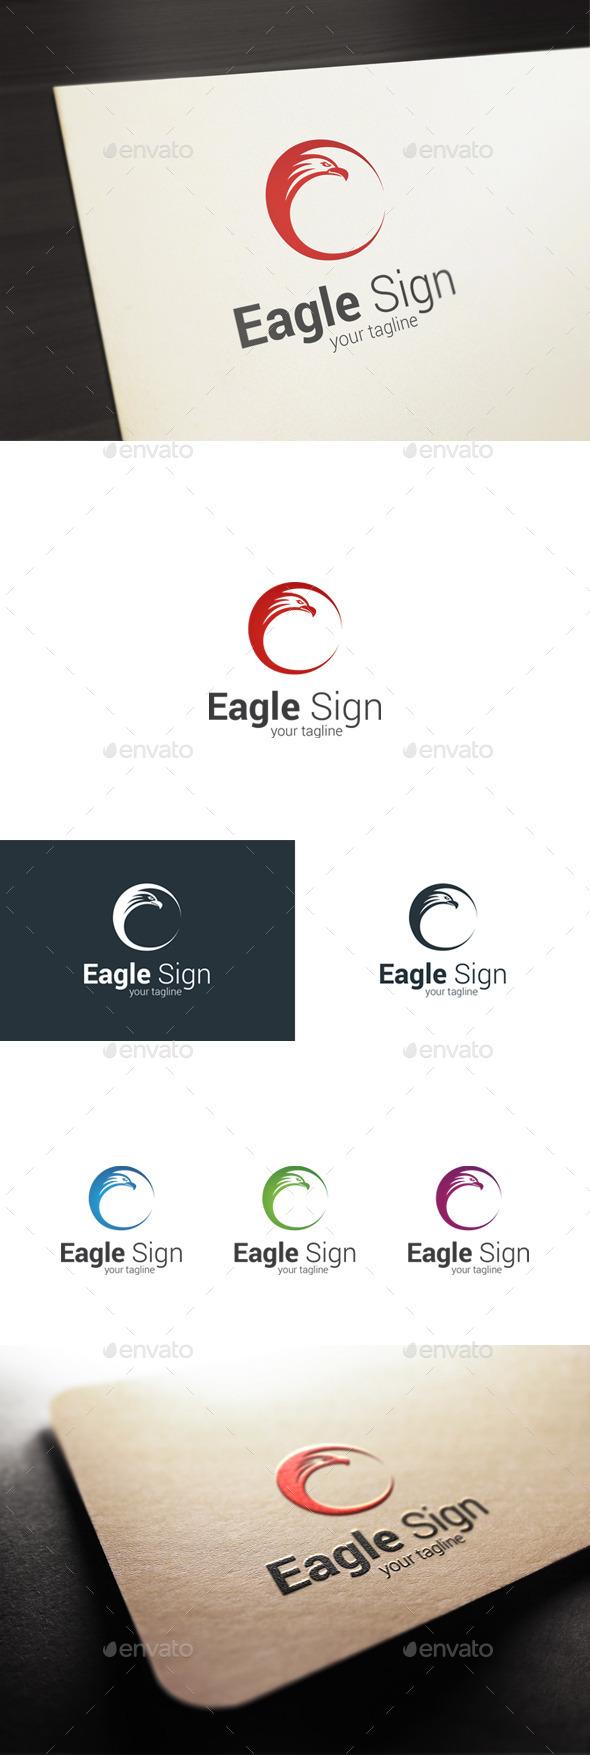 GraphicRiver Eagle Sign Logo 10600002